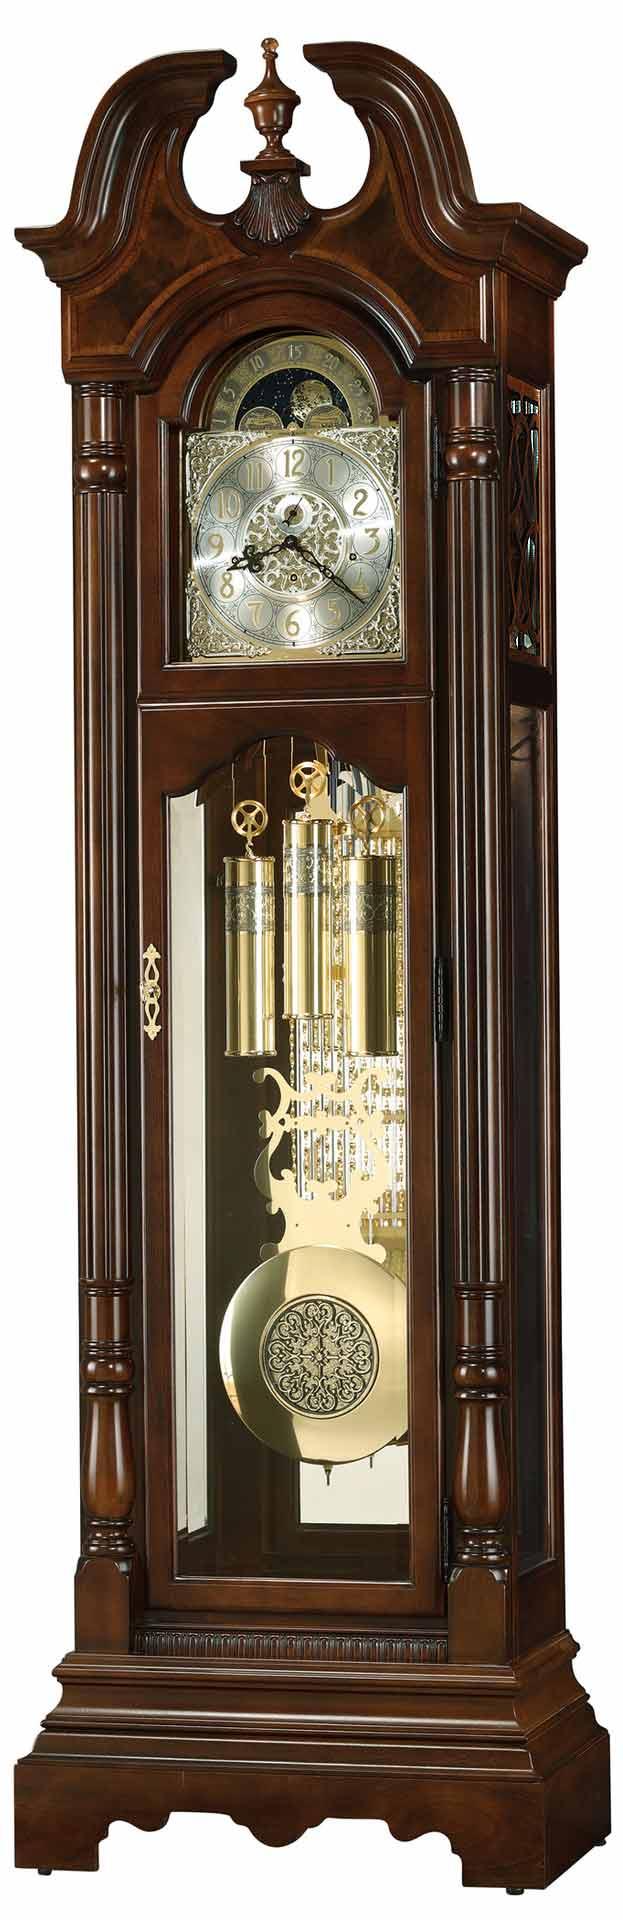 Howard Miller Bretheran 611260 Grandfather Clock  The